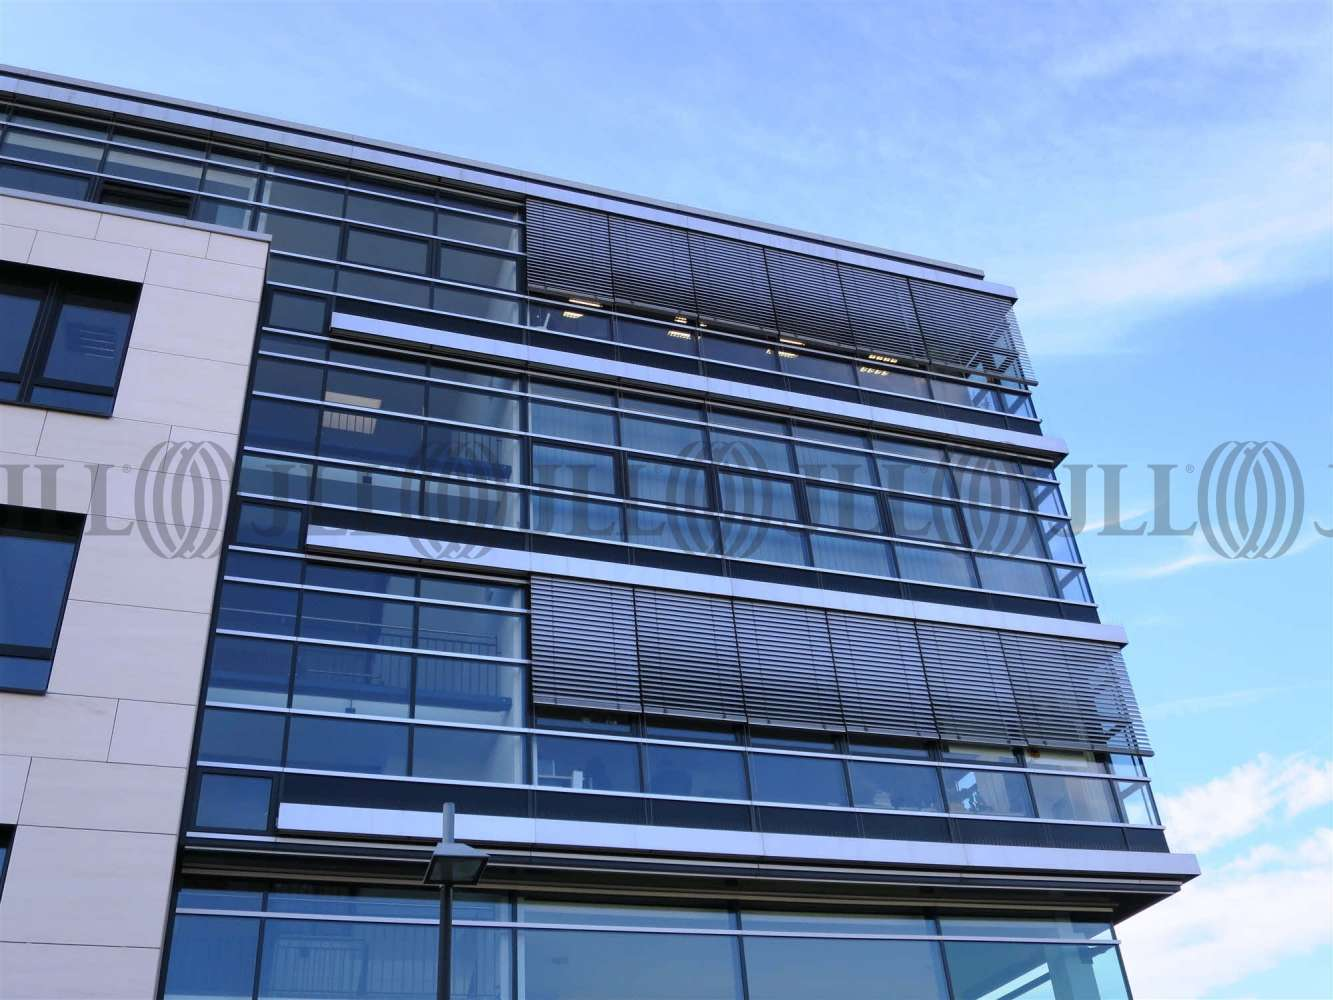 Büros Bad vilbel, 61118 - Büro - Bad Vilbel - F1113 - 9524711